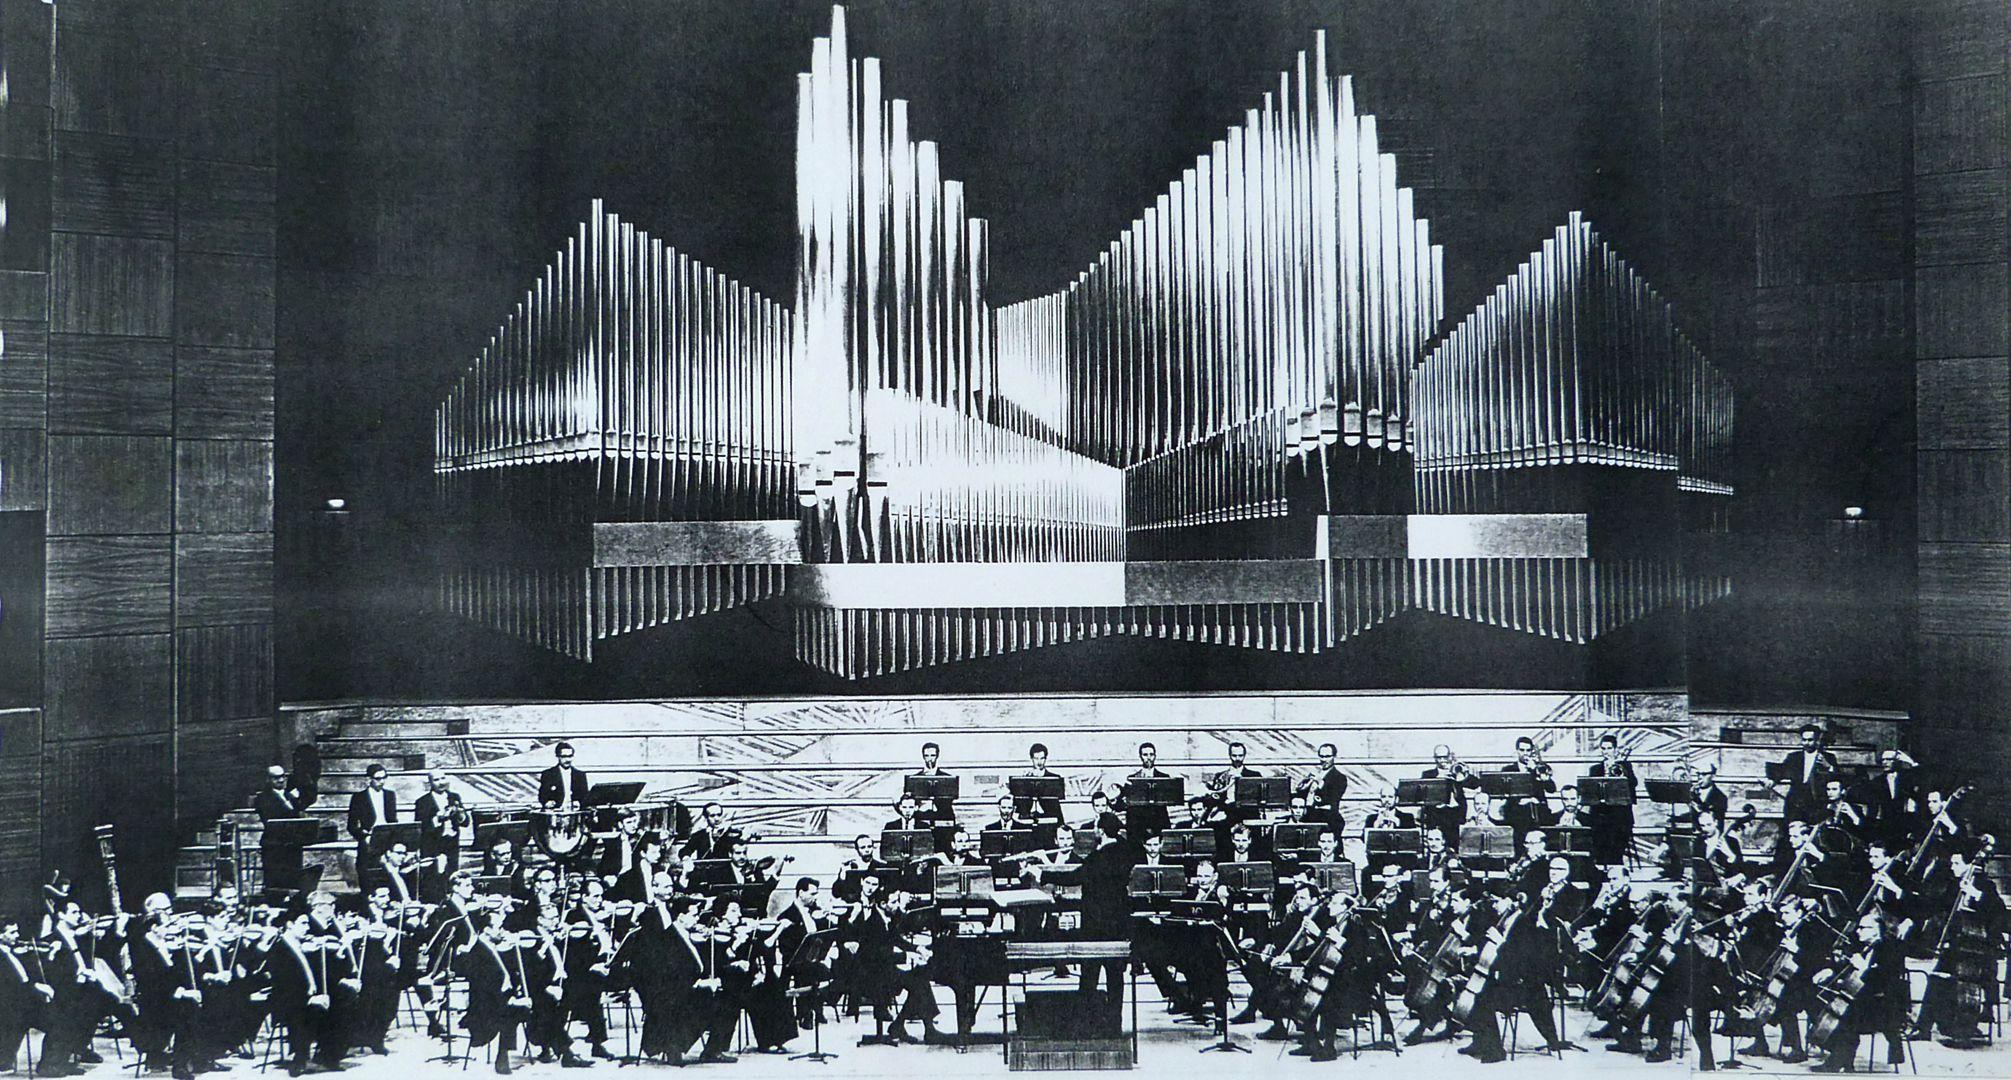 Organ front in Meistersingerhalle Nuremberg Organ front and orchestra podium